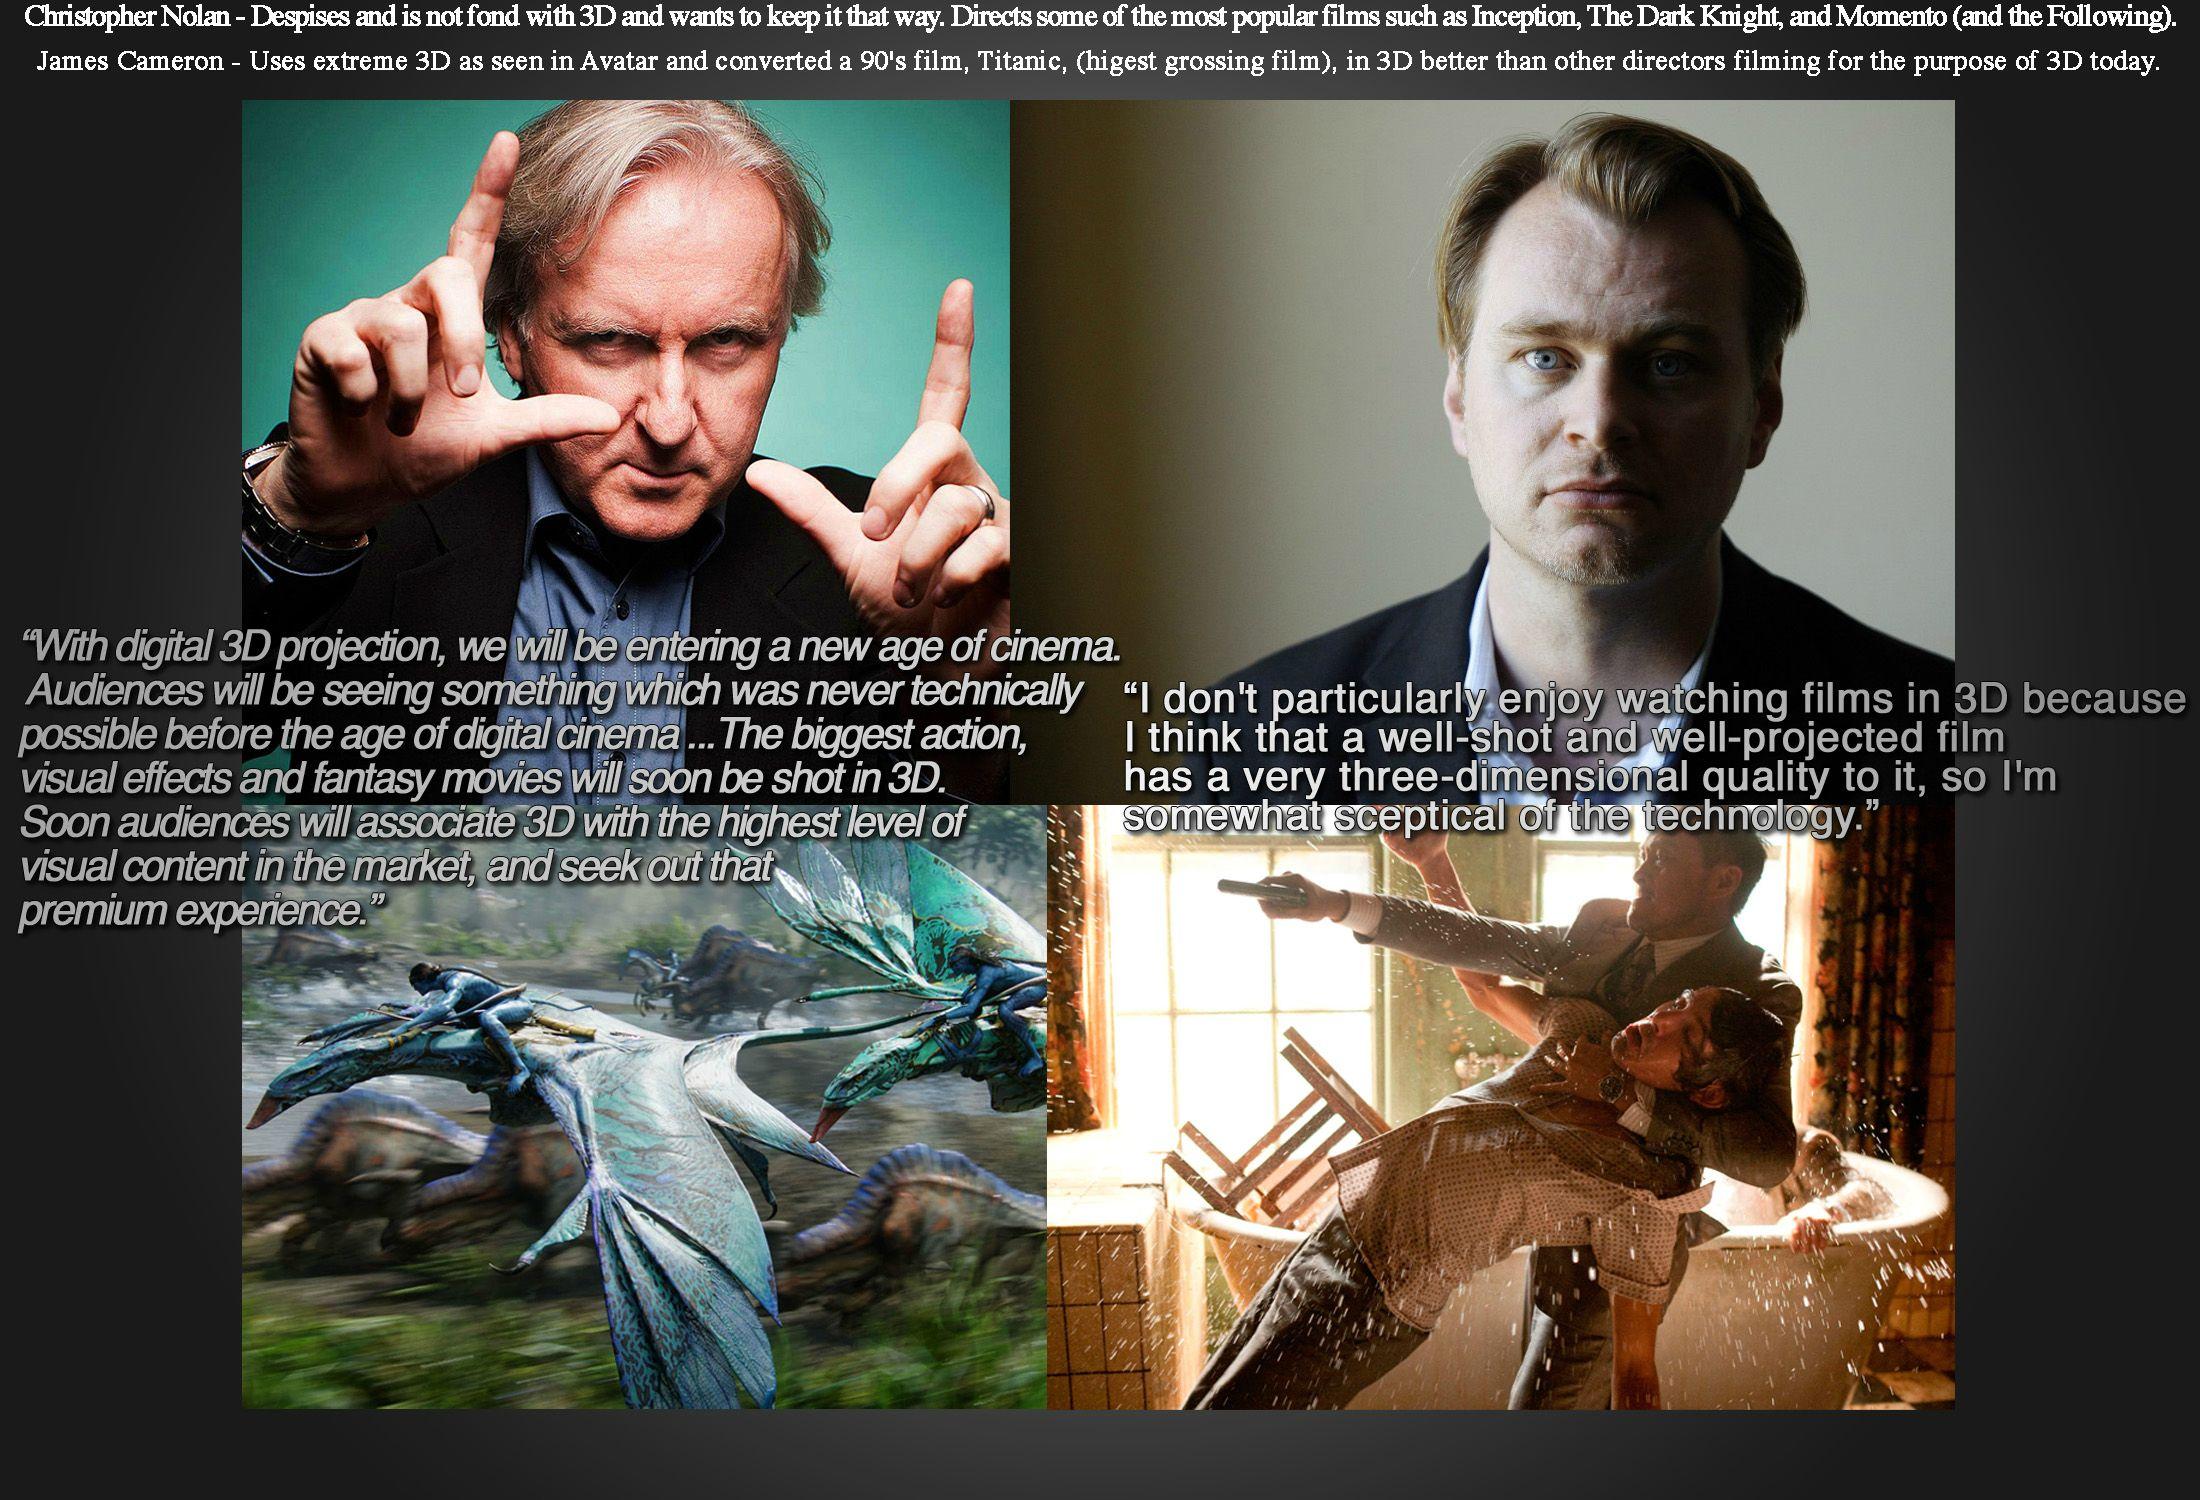 Christopher Nolan's quote #3